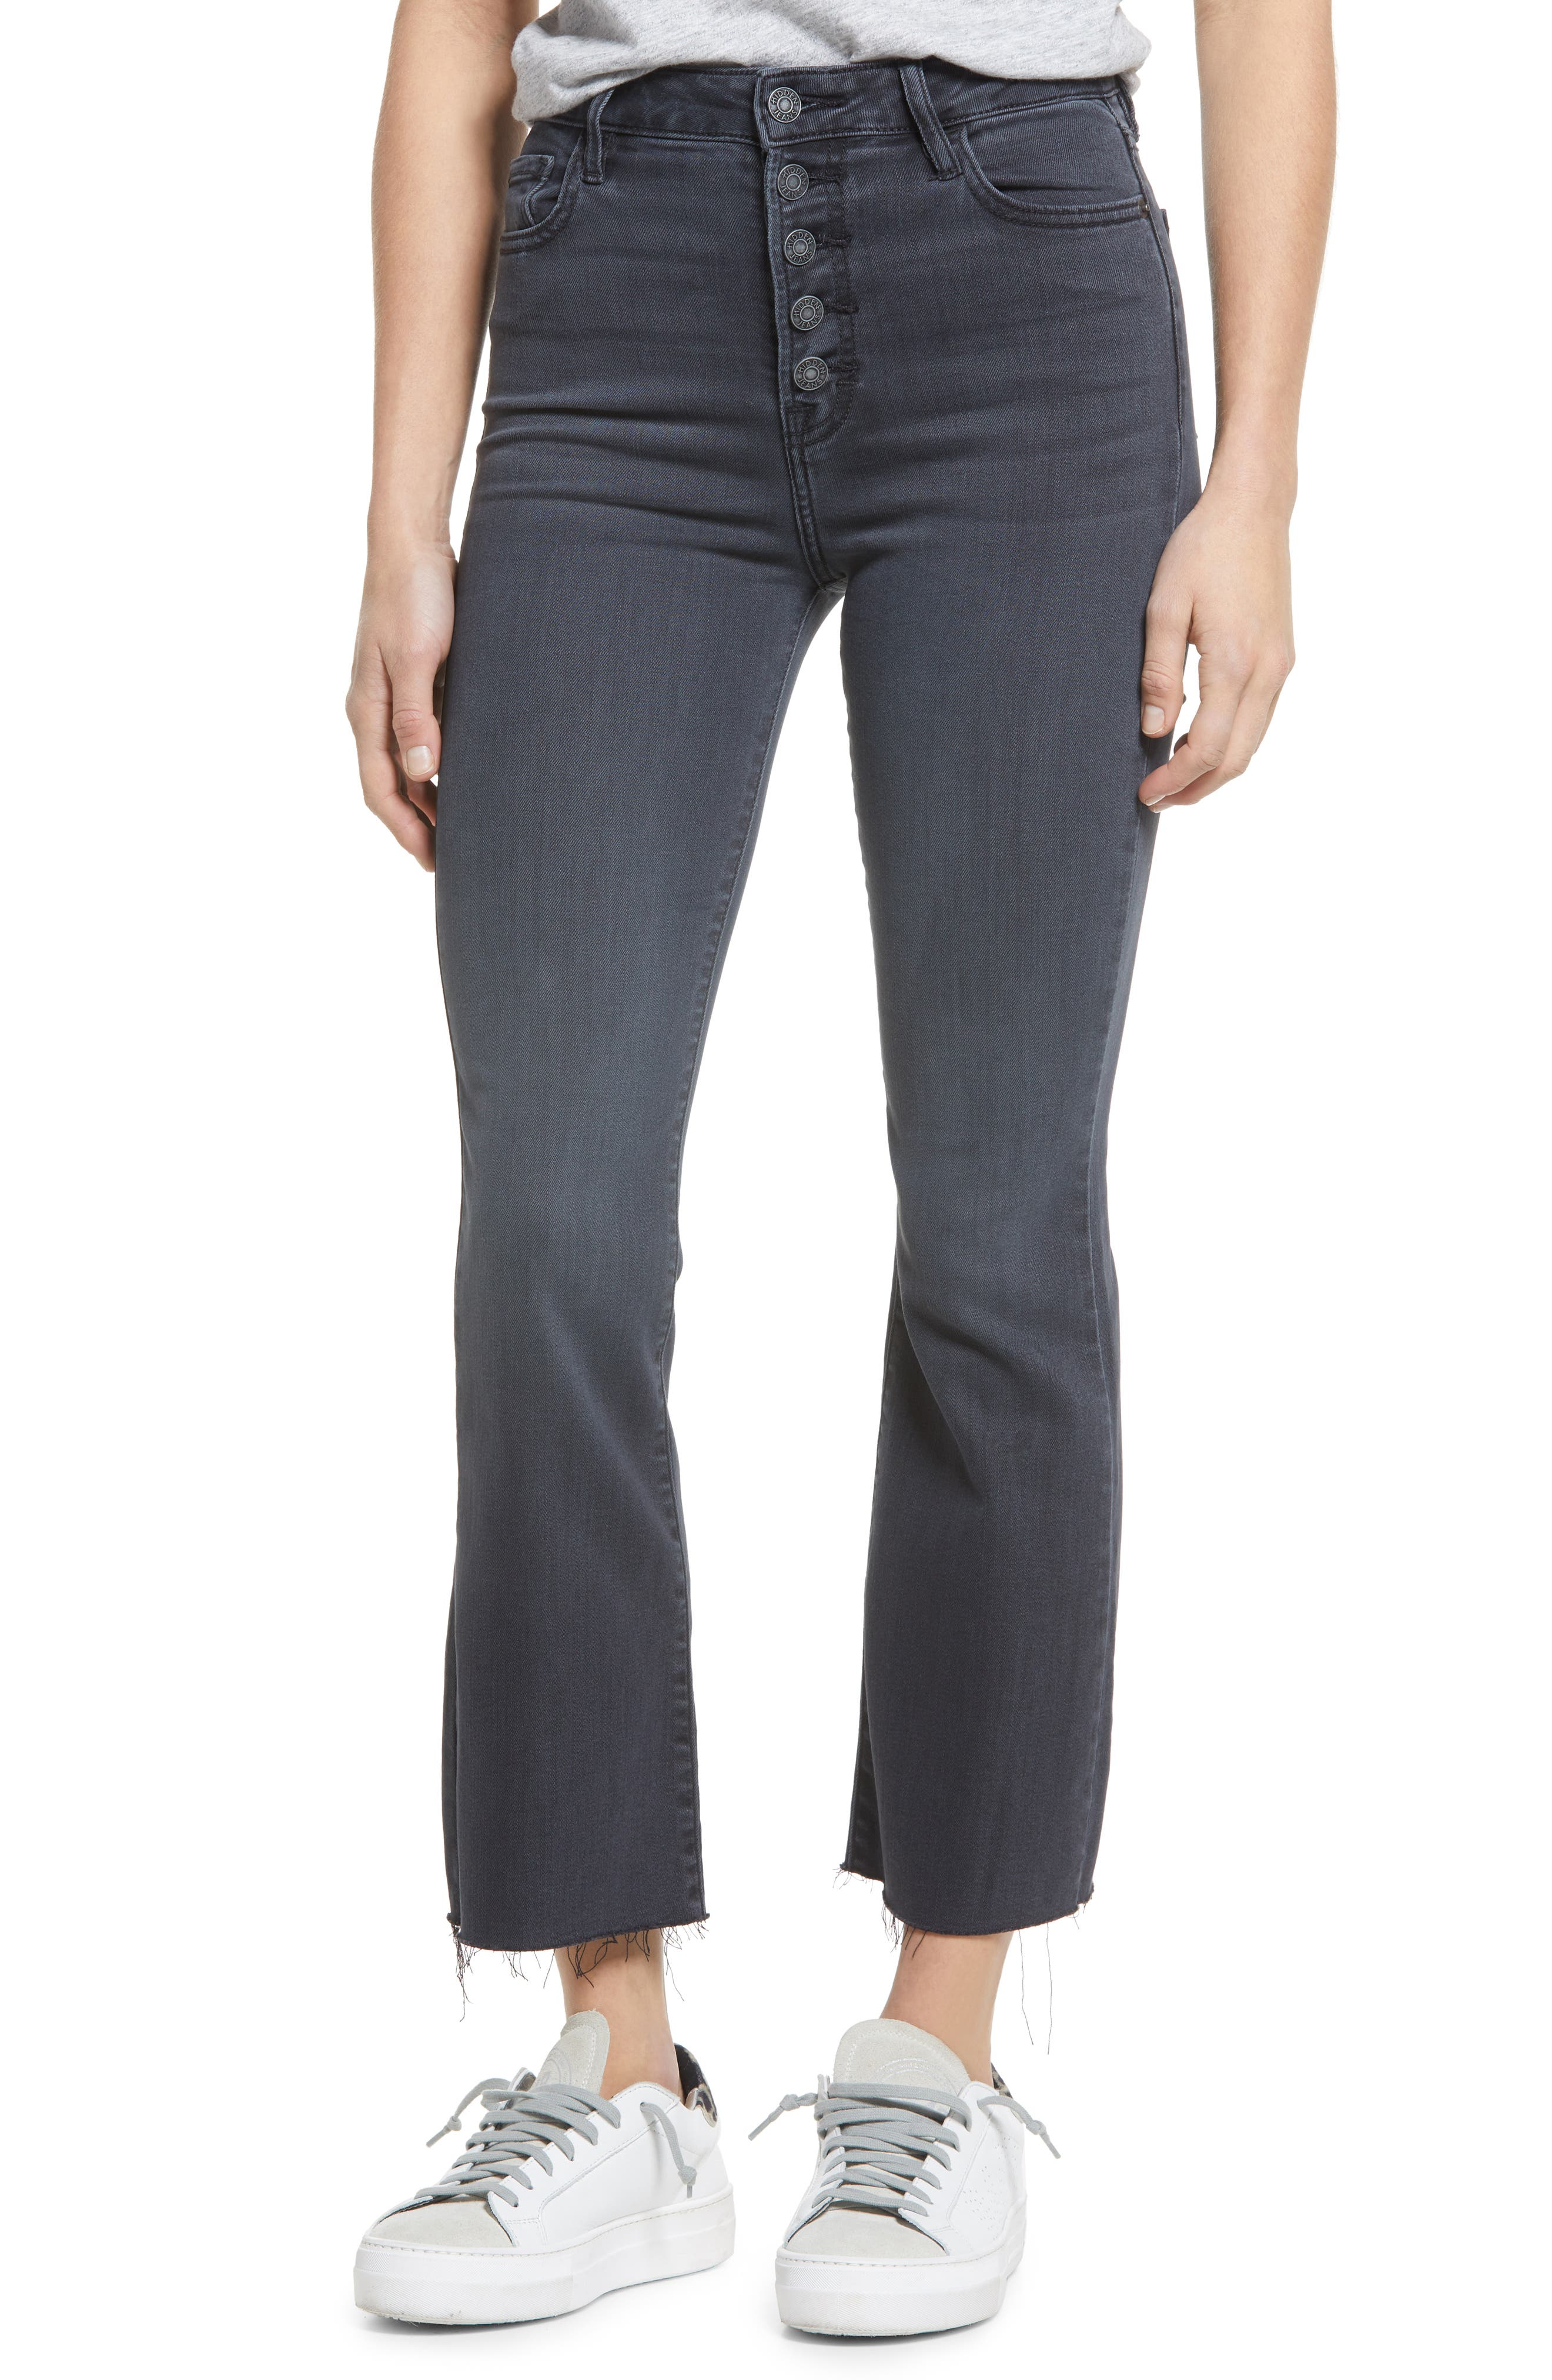 High Waist Ankle Flare Jeans